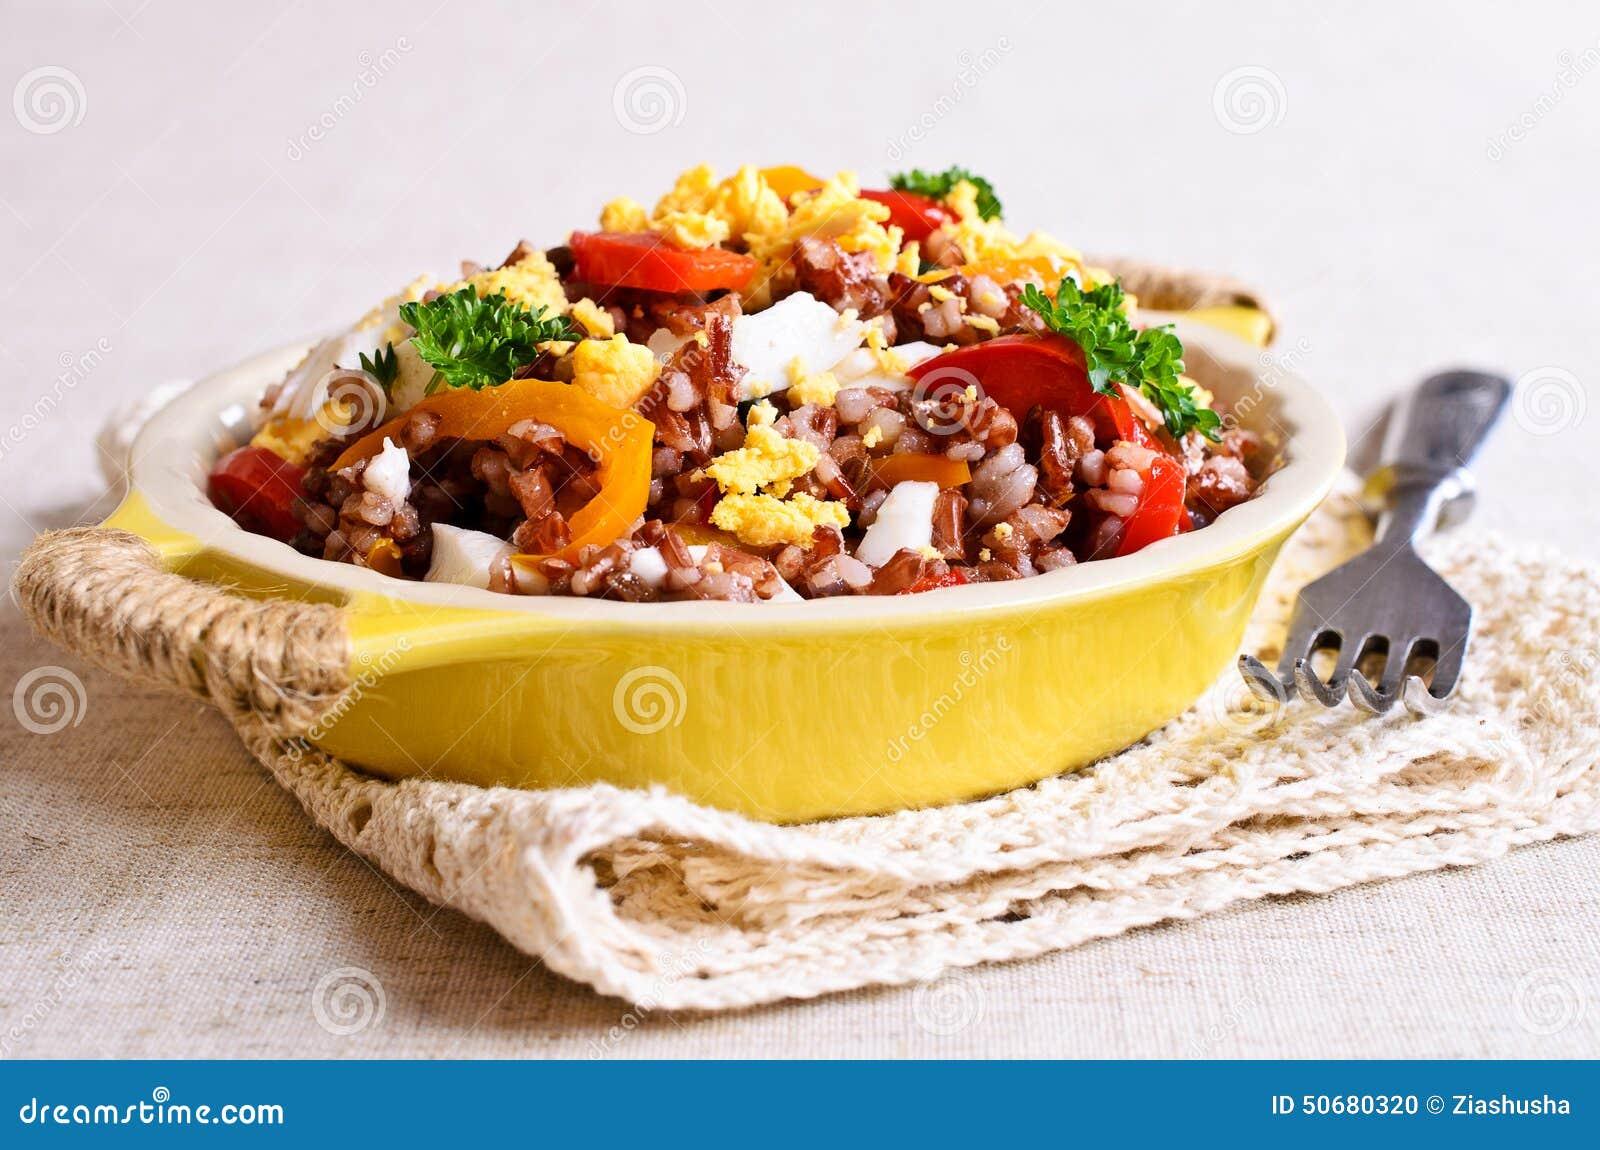 Download 与菜和鸡蛋的糙米 库存照片. 图片 包括有 browne, 可口, 健康, 美食, 牌照, 午餐, 油煎 - 50680320